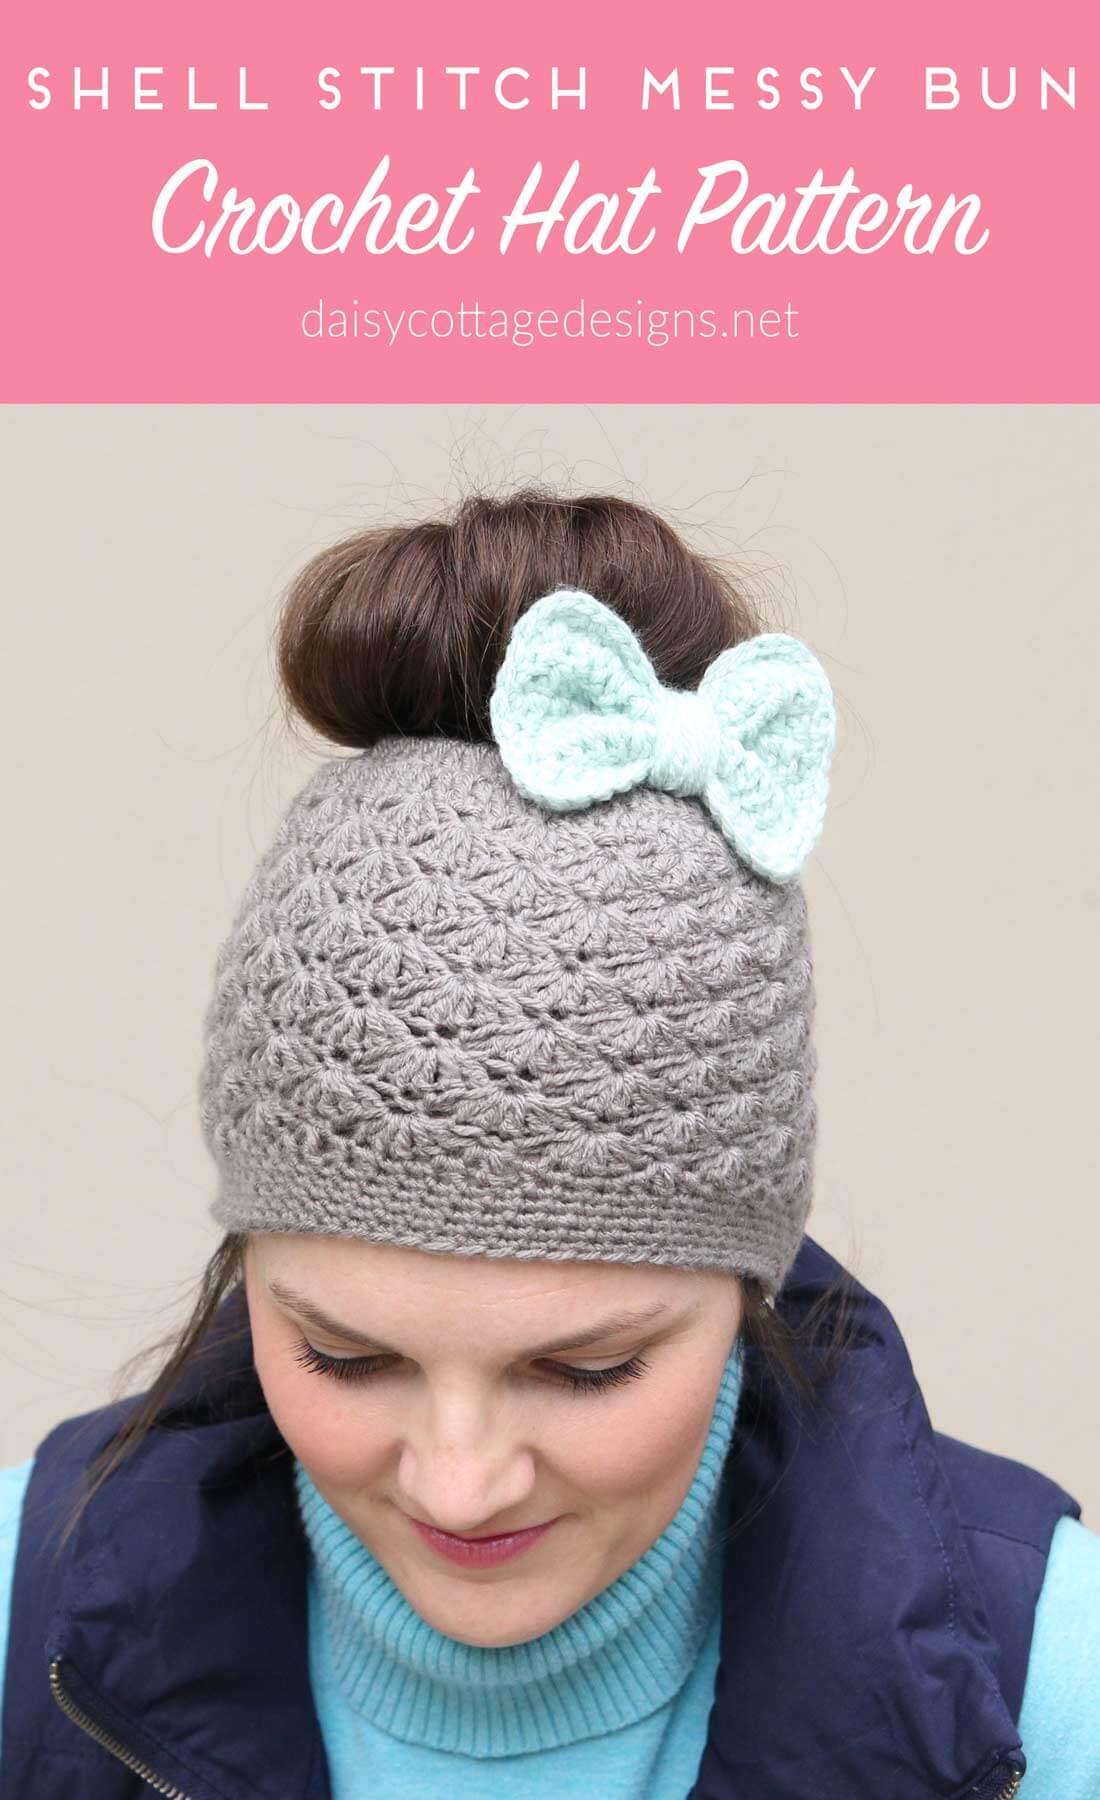 Crochet Alligator Hat Shell Stitch Messy Bun Crochet Hat Pattern Daisy Cottage Designs